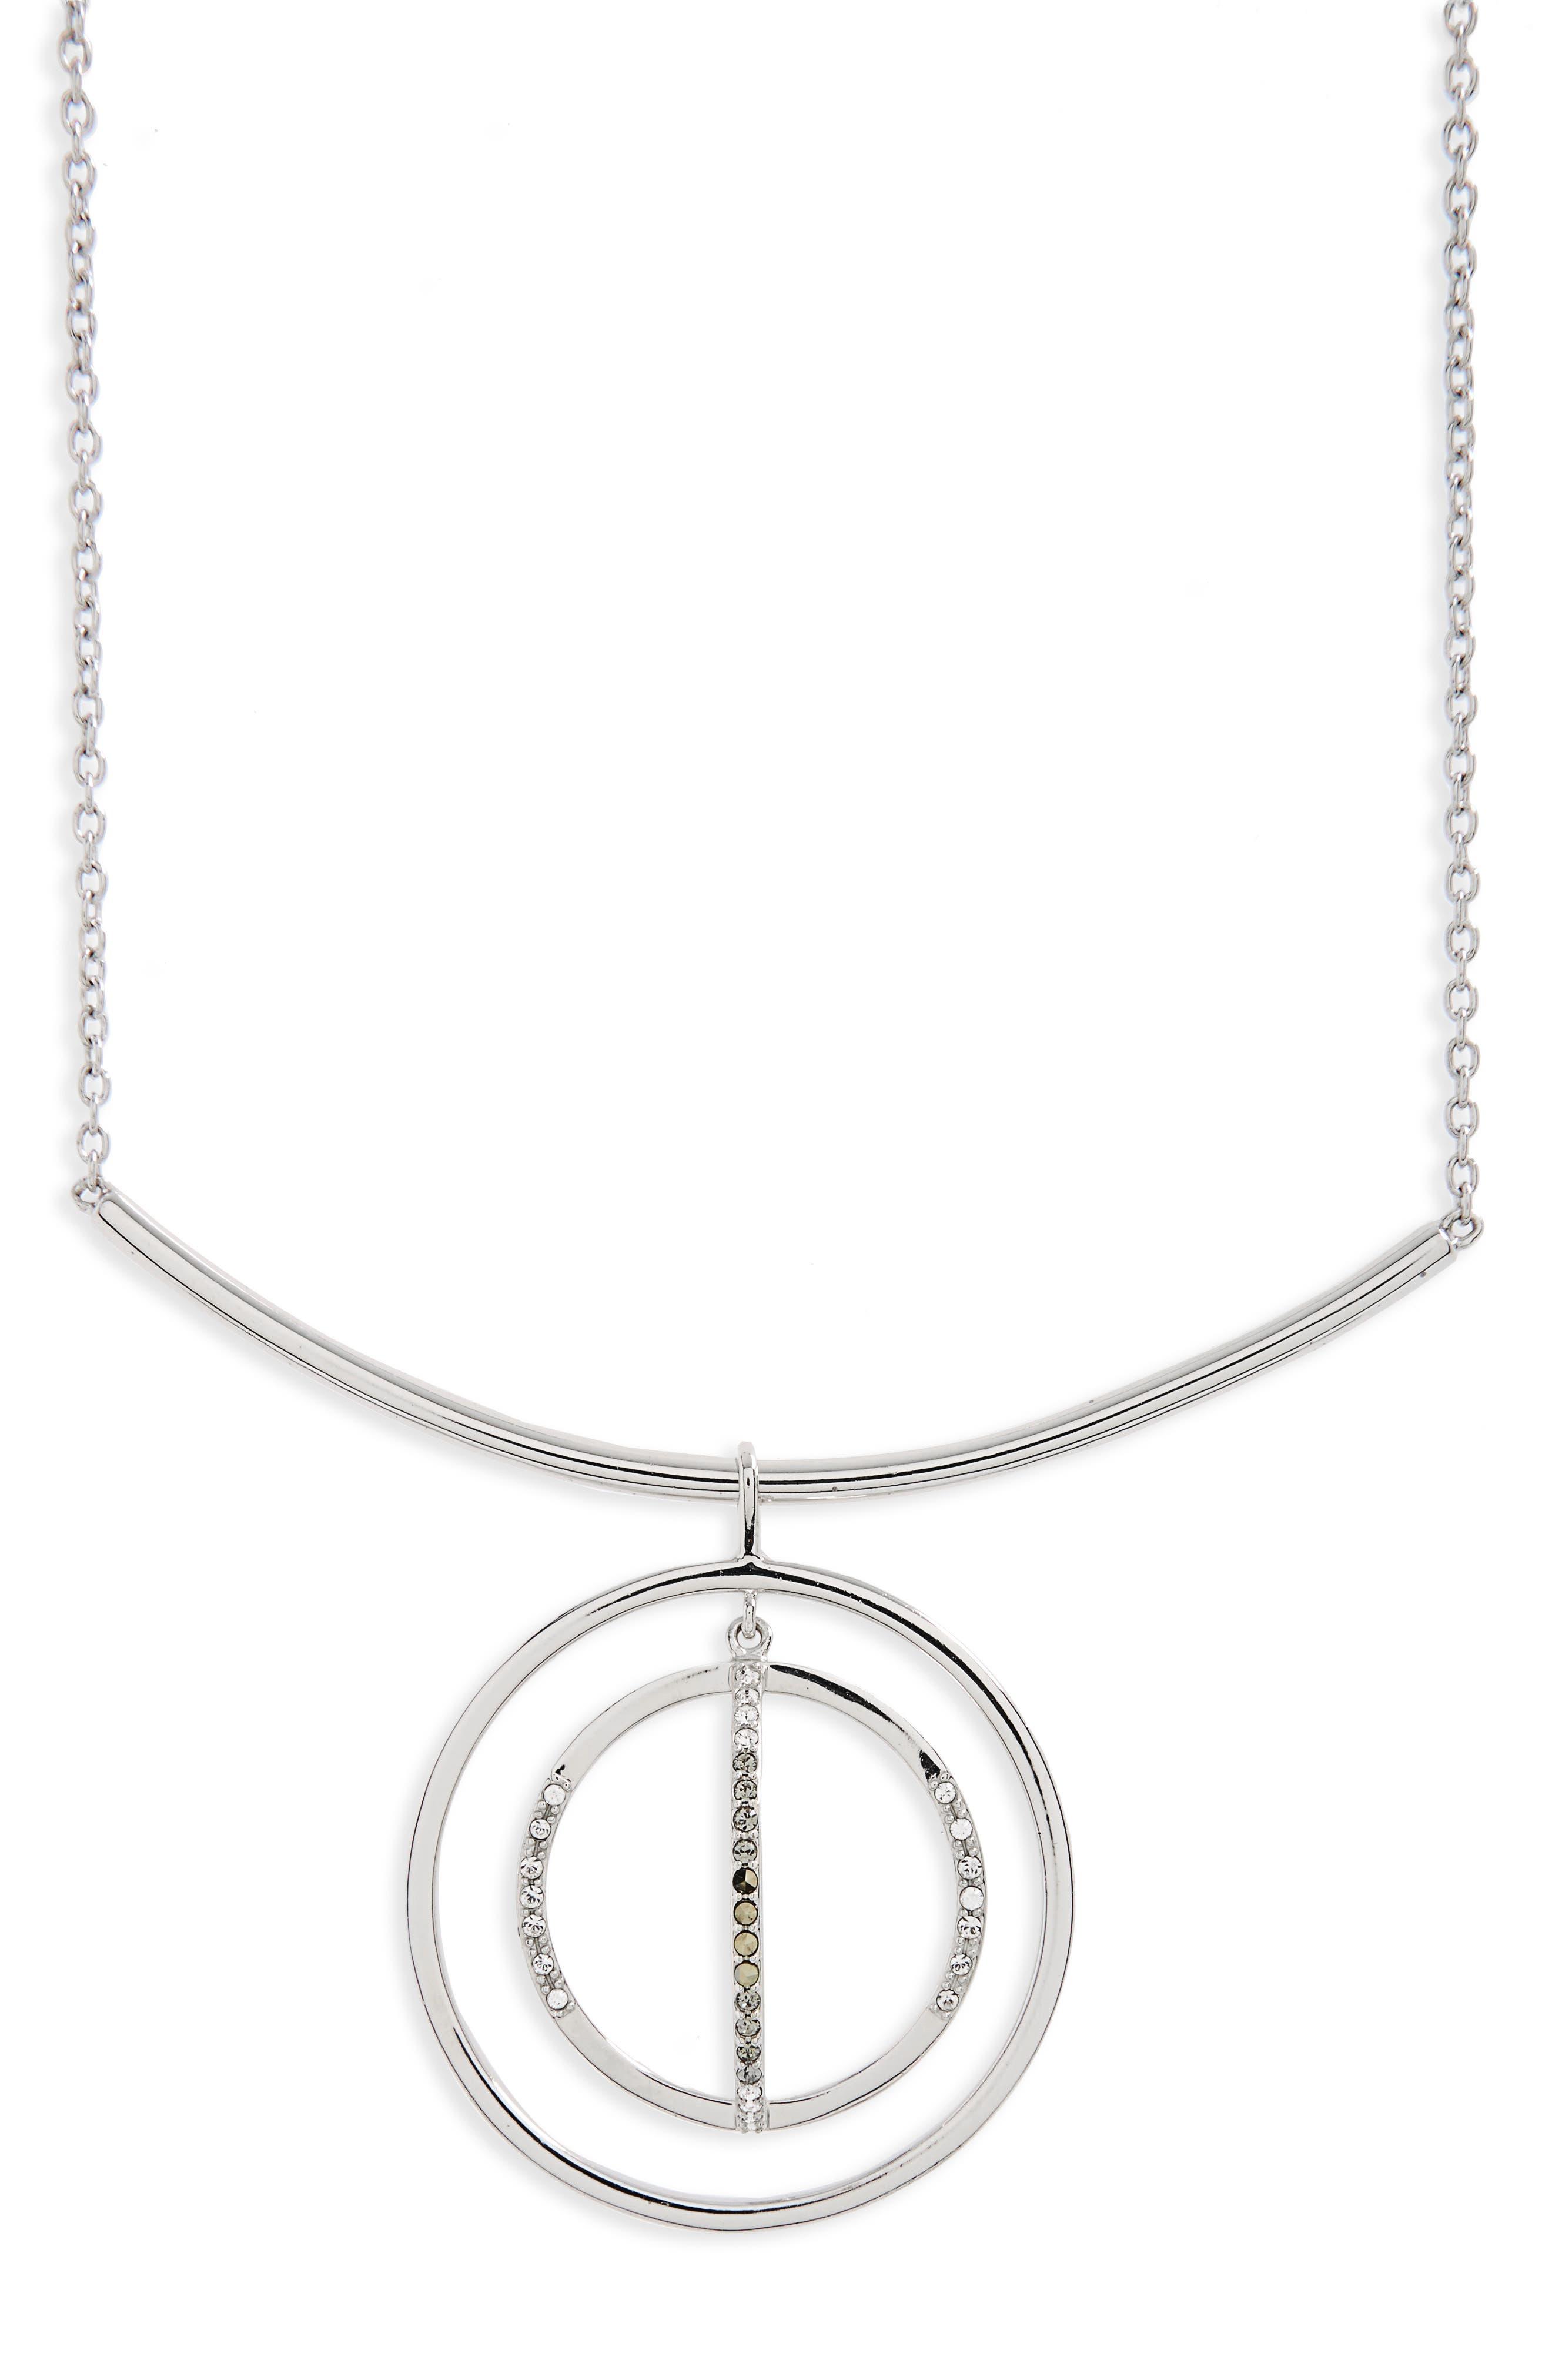 JUDITH JACK Silver Sparkle Circle Pendant Necklace